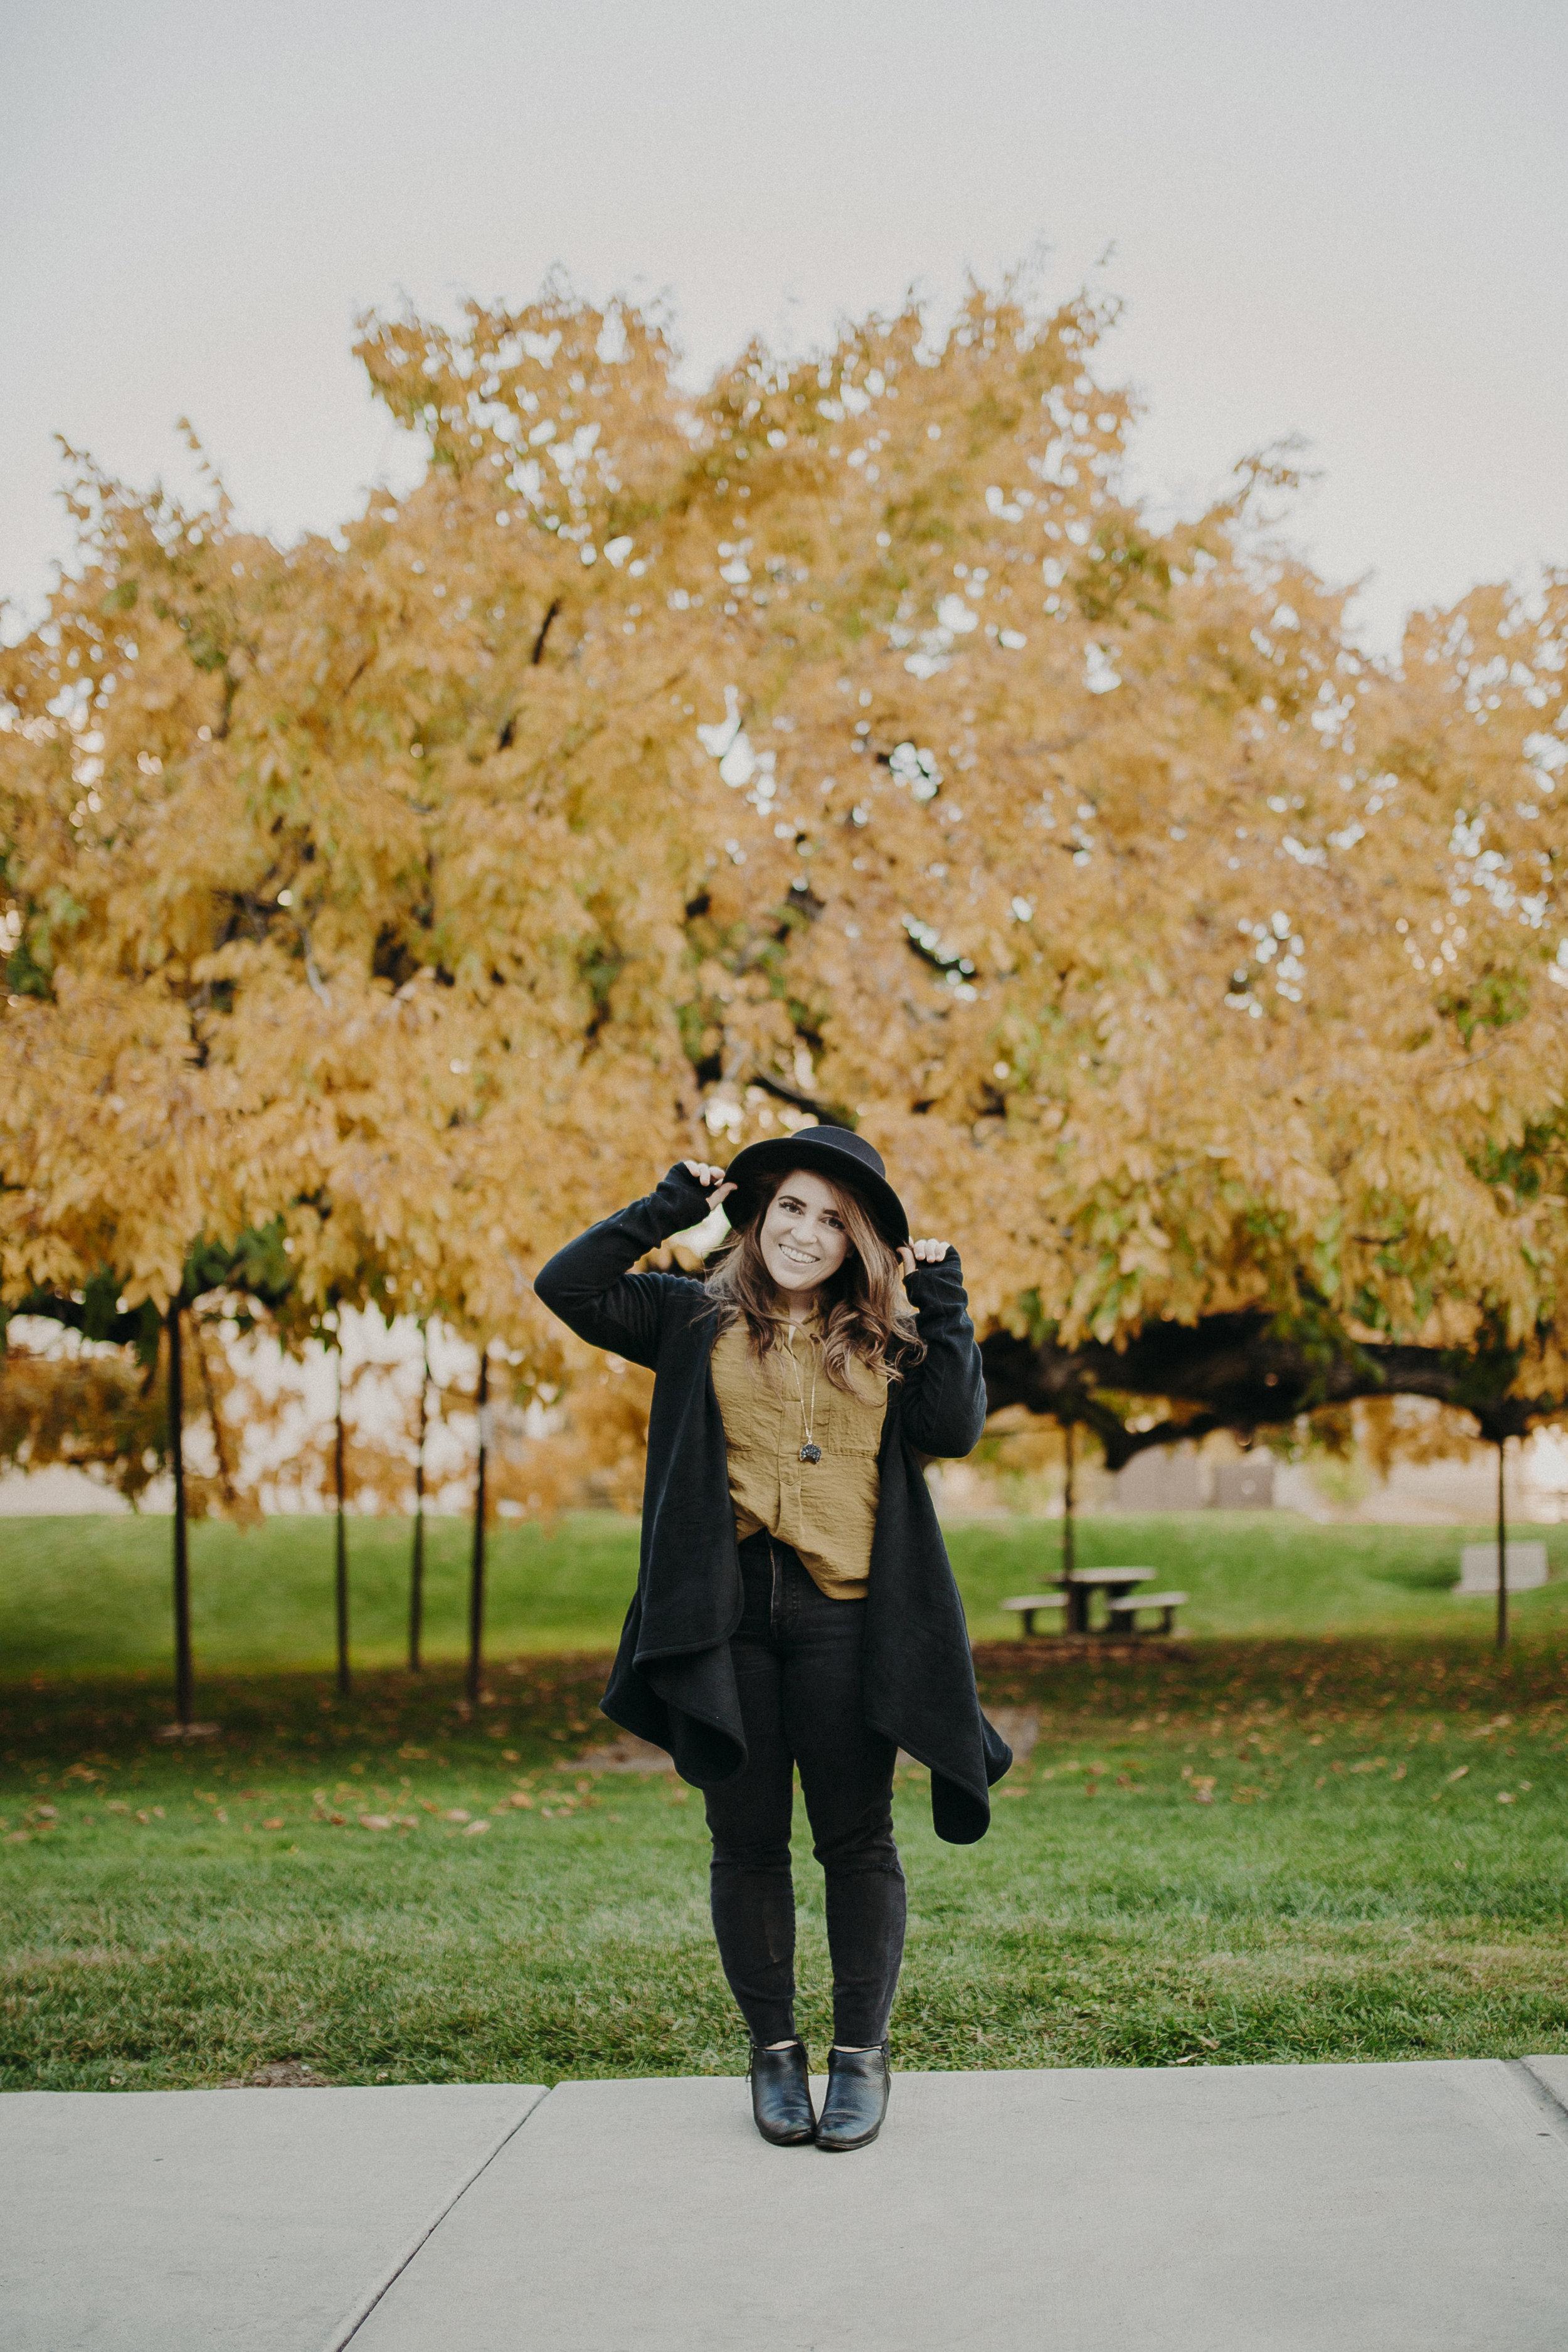 fall-outfit-ideas-13.jpg